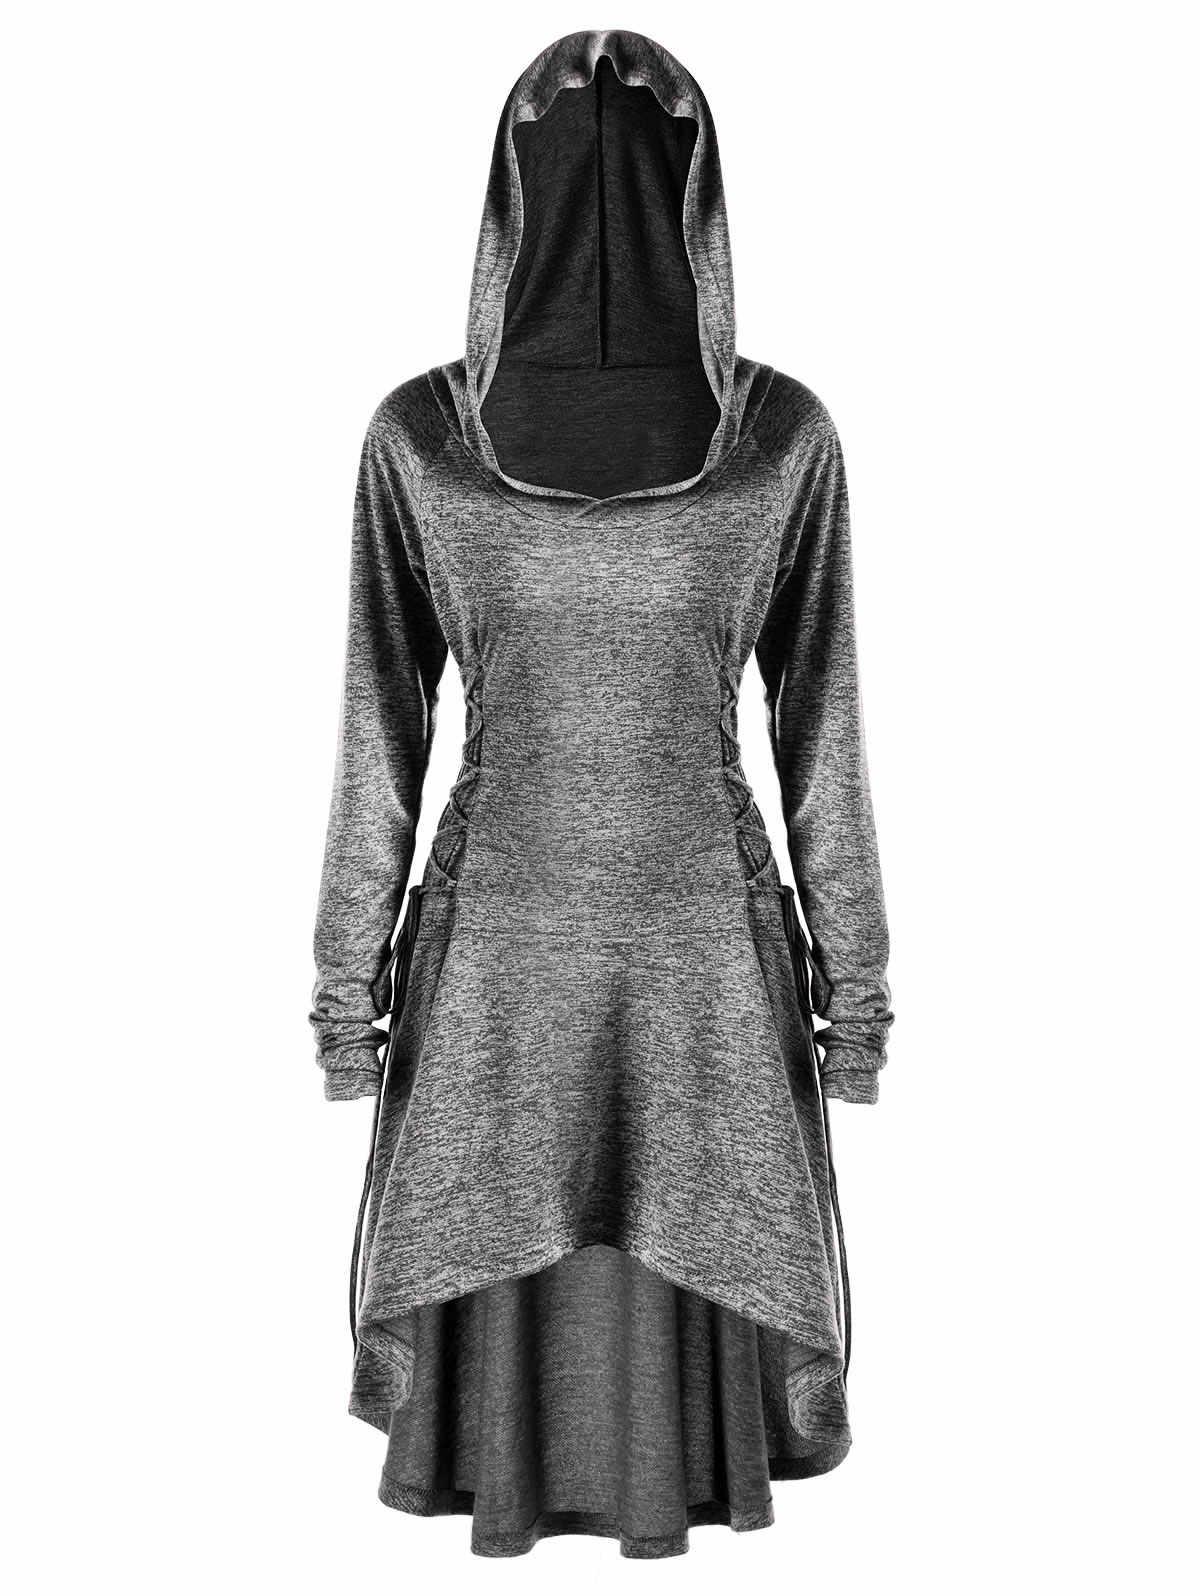 ac1ba7307bf Gamiss Autumn Women Casual Long Hoodies Sweatshirt Plus Size Lace Up Dip  Hem Hoodie Femme Bts